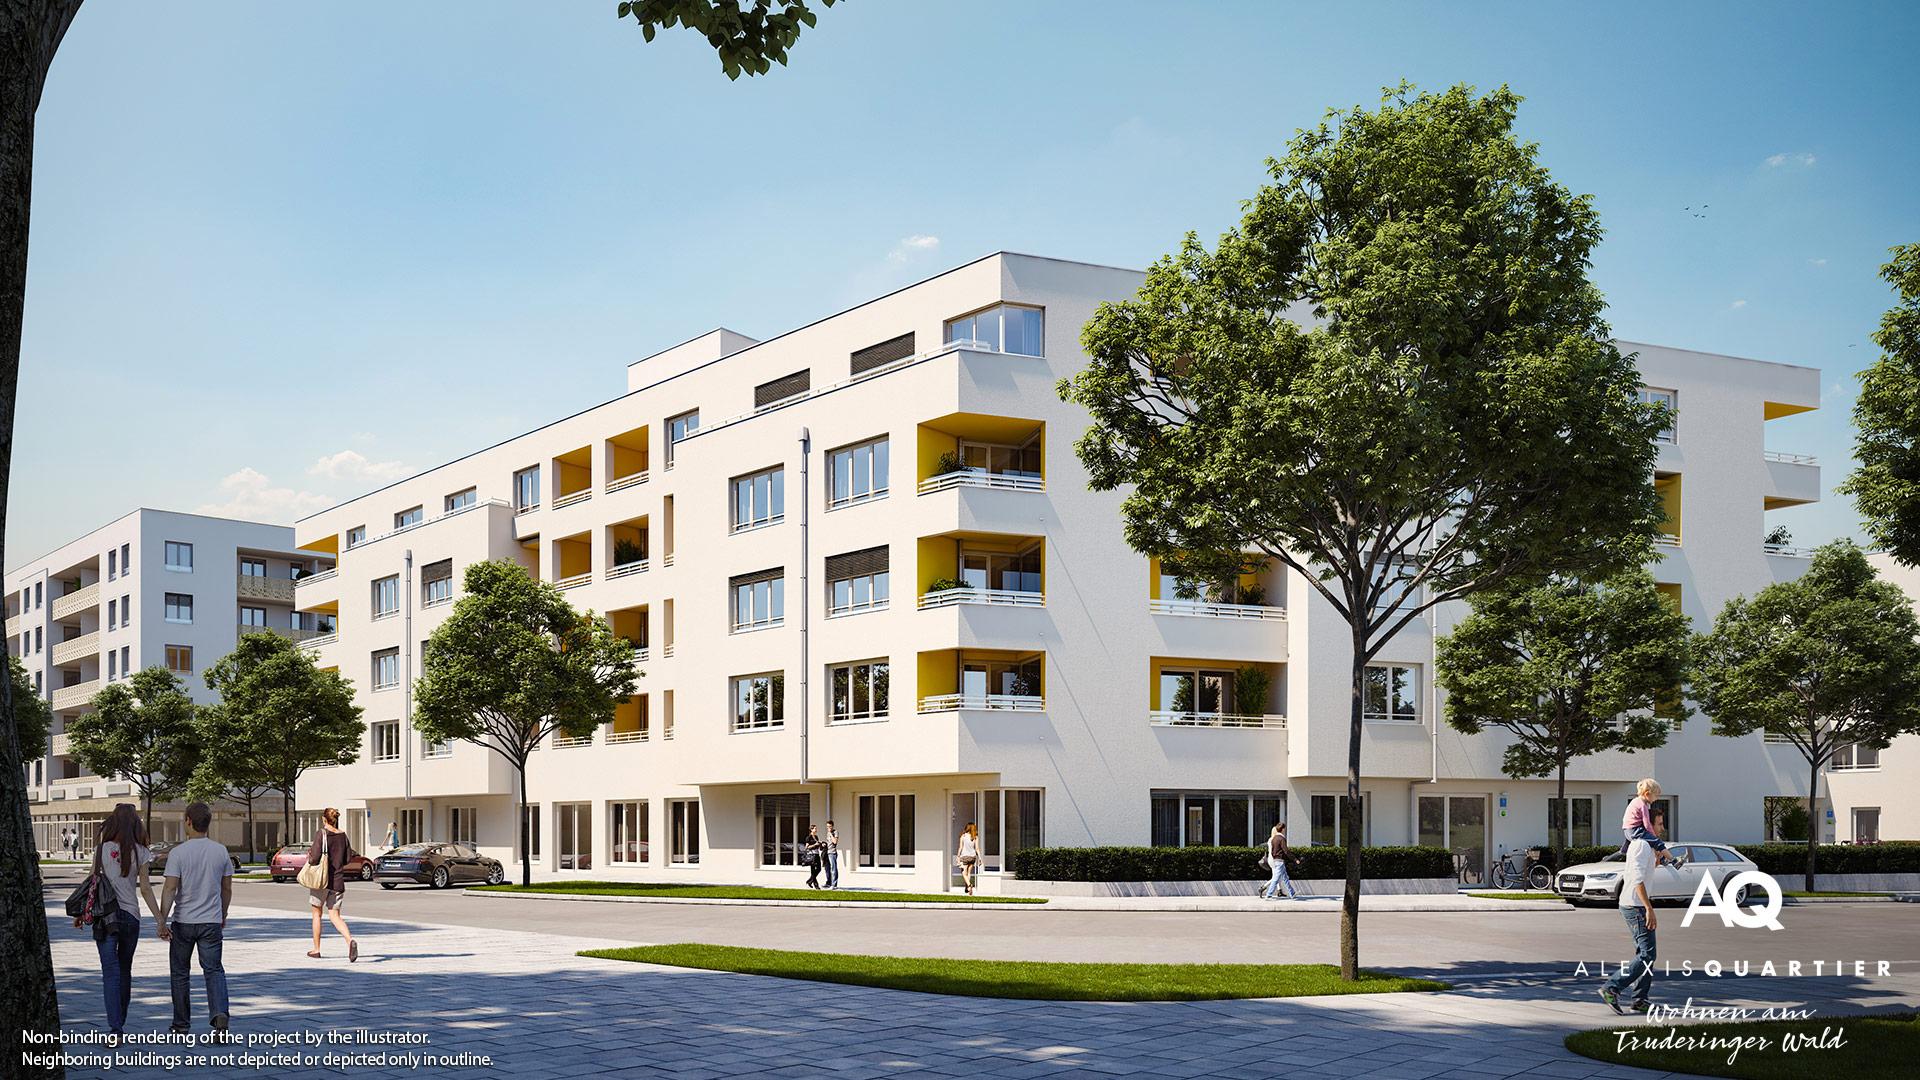 Property Alexisquartier - Wohnen am Truderinger Wald - Illustration 2